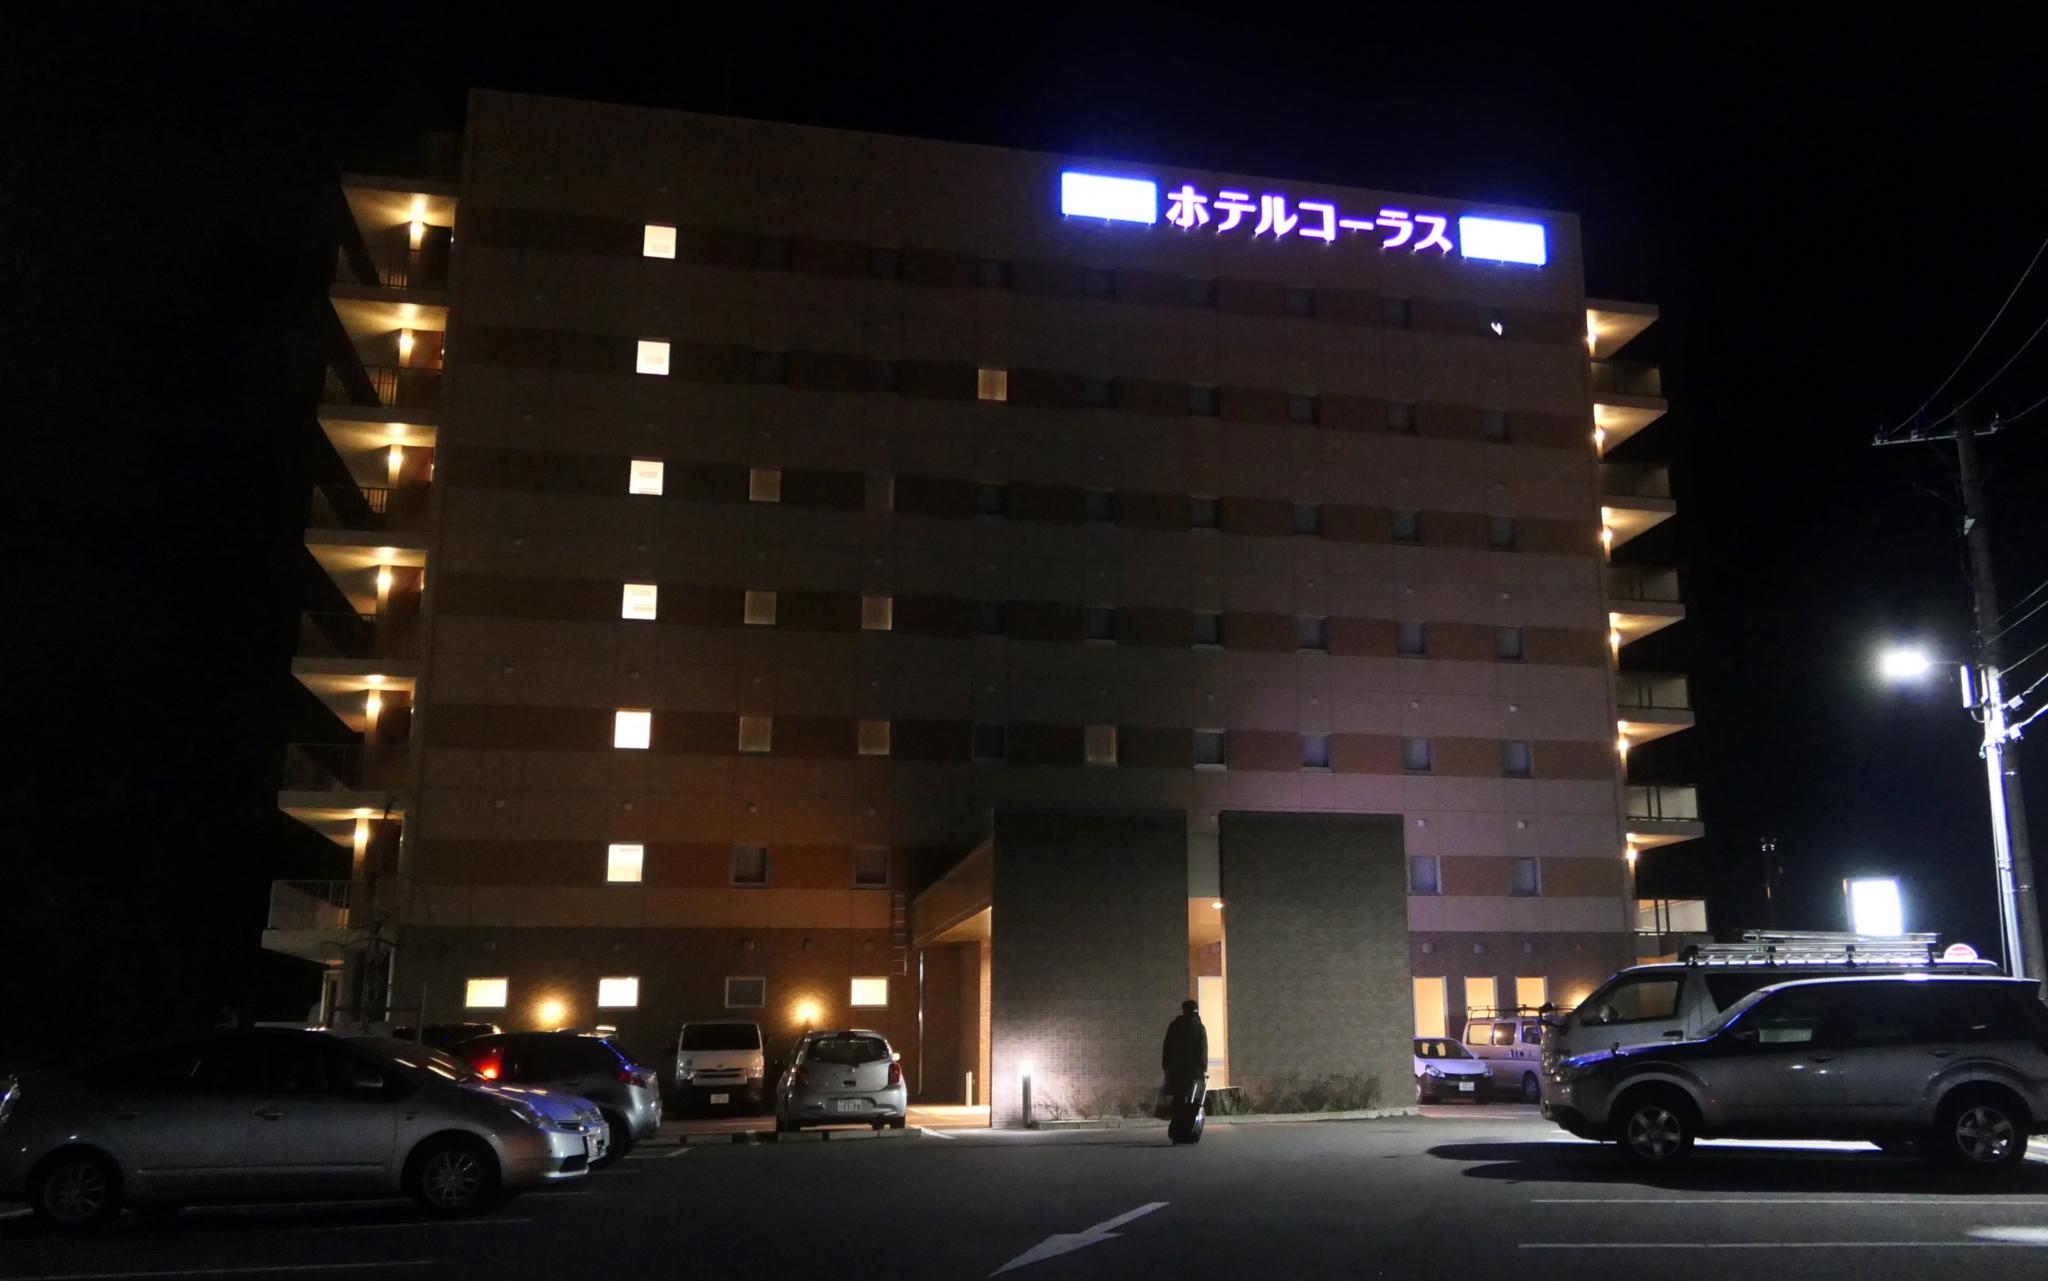 f:id:ToshUeno:20171123172935j:plain